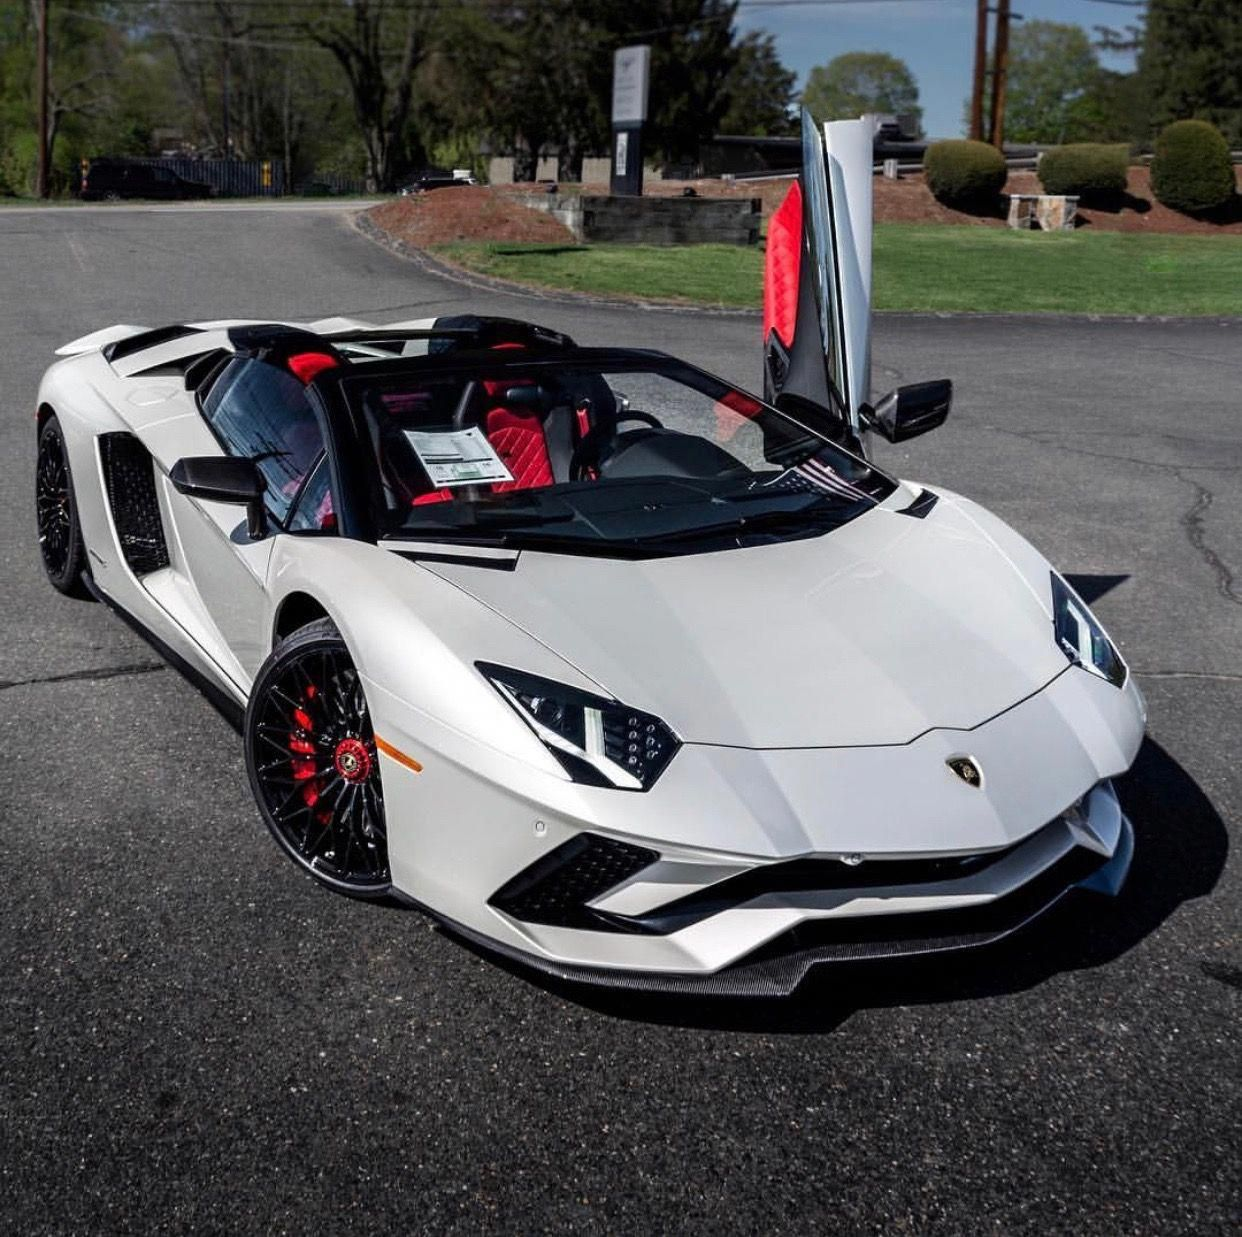 Lamborghini: Lamborghini Aventador S Roadster Painted In Balloon White Photo Taken By: @lamboboston On